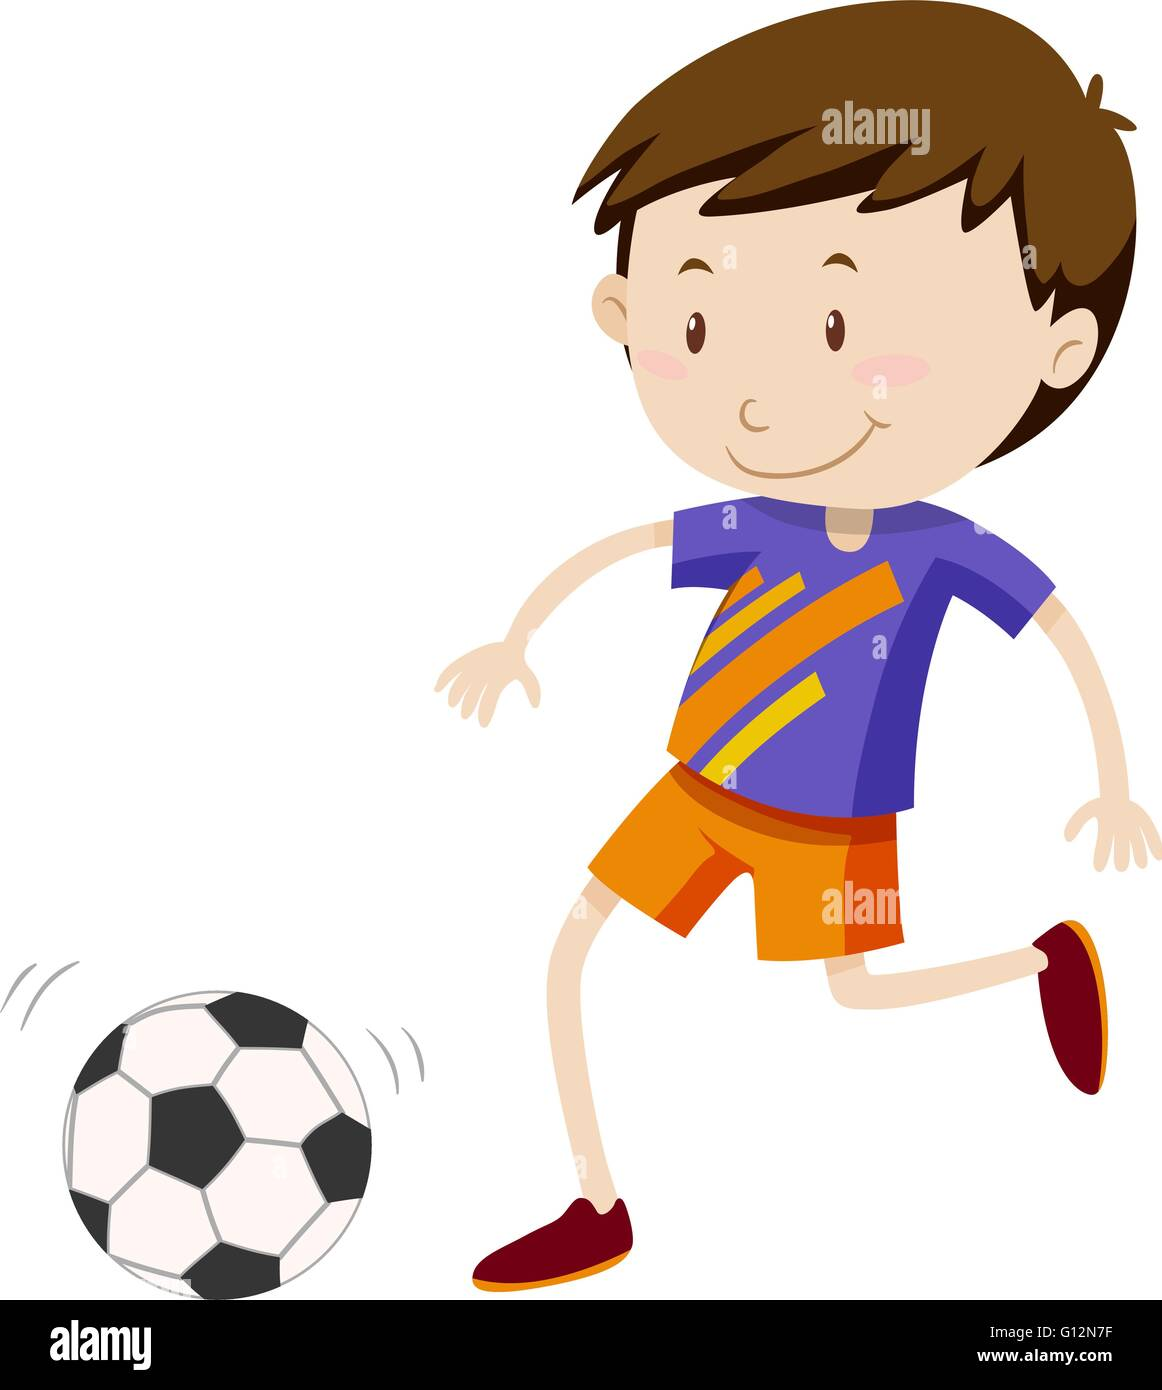 Junge Kicing Soccer Ball Abbildung Stock Vektor